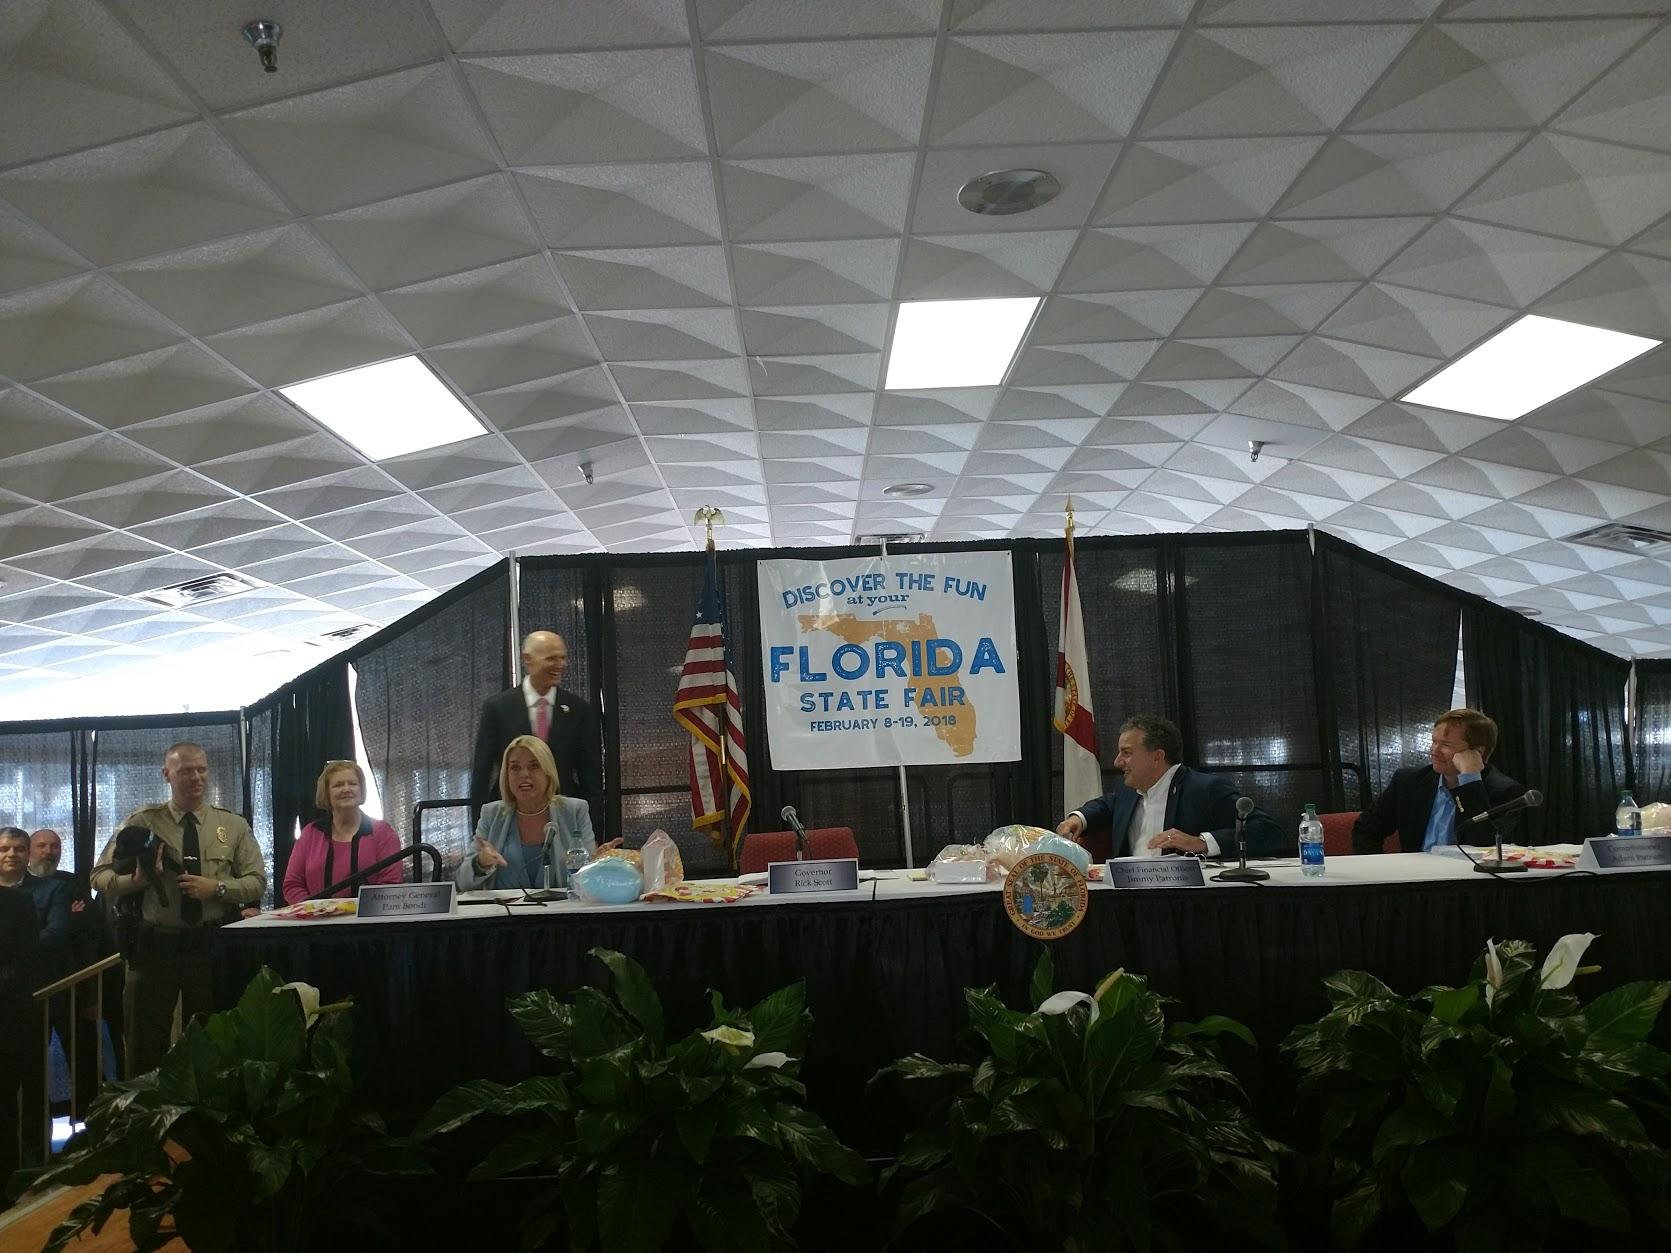 Pam Bondi Says Rick Scott Deserves Lion S Share Of Credit For Florida S Economic Growth